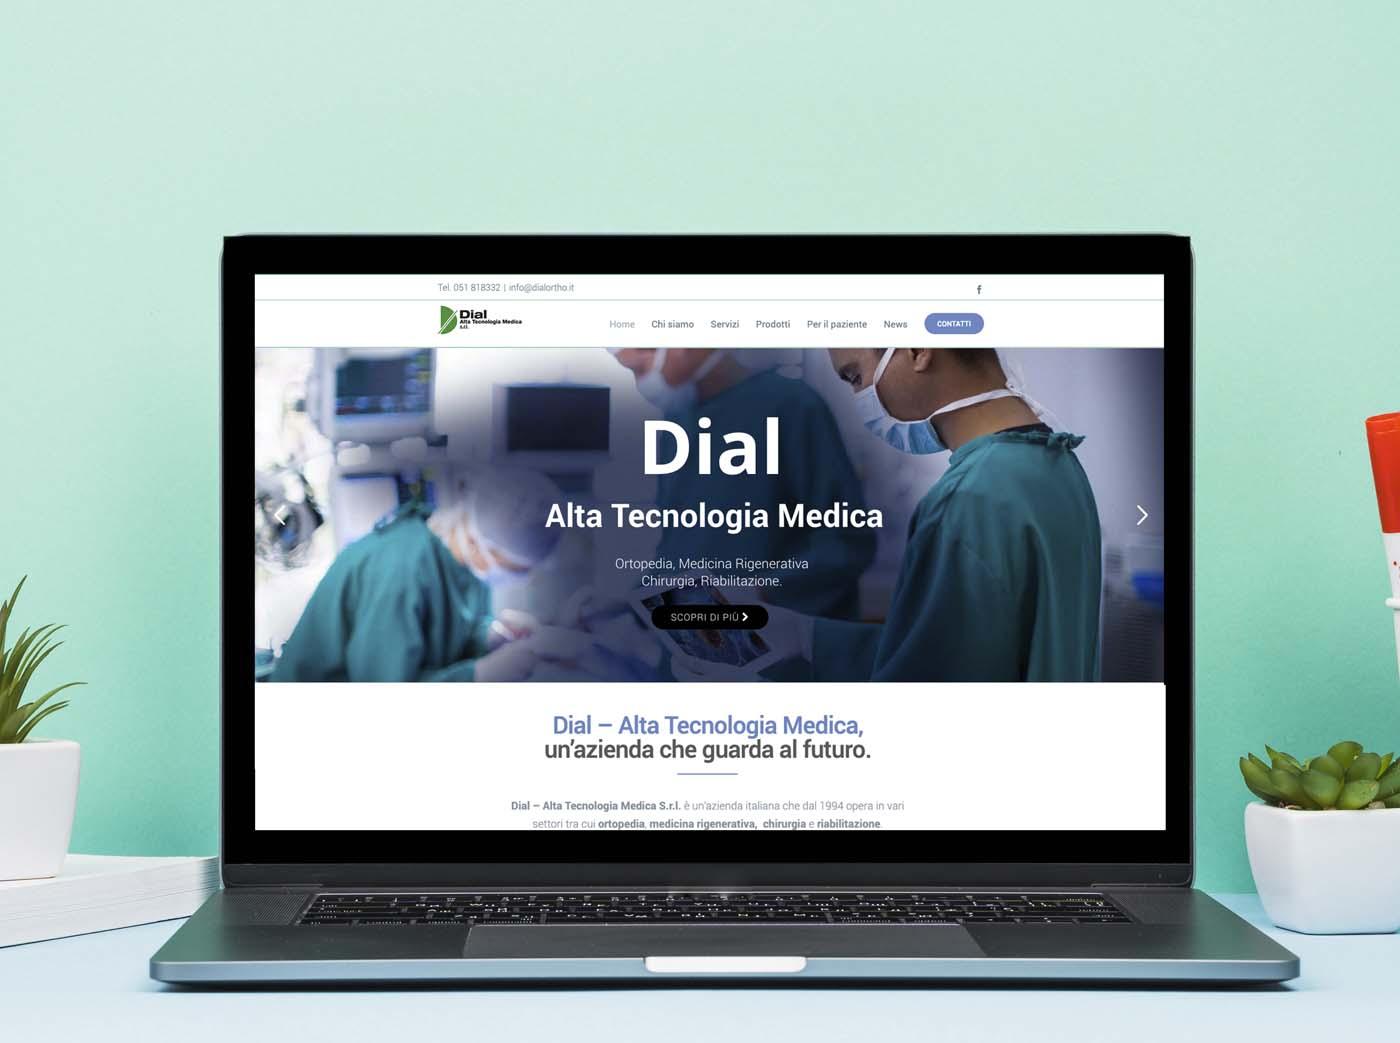 dial alta tecnologia medica